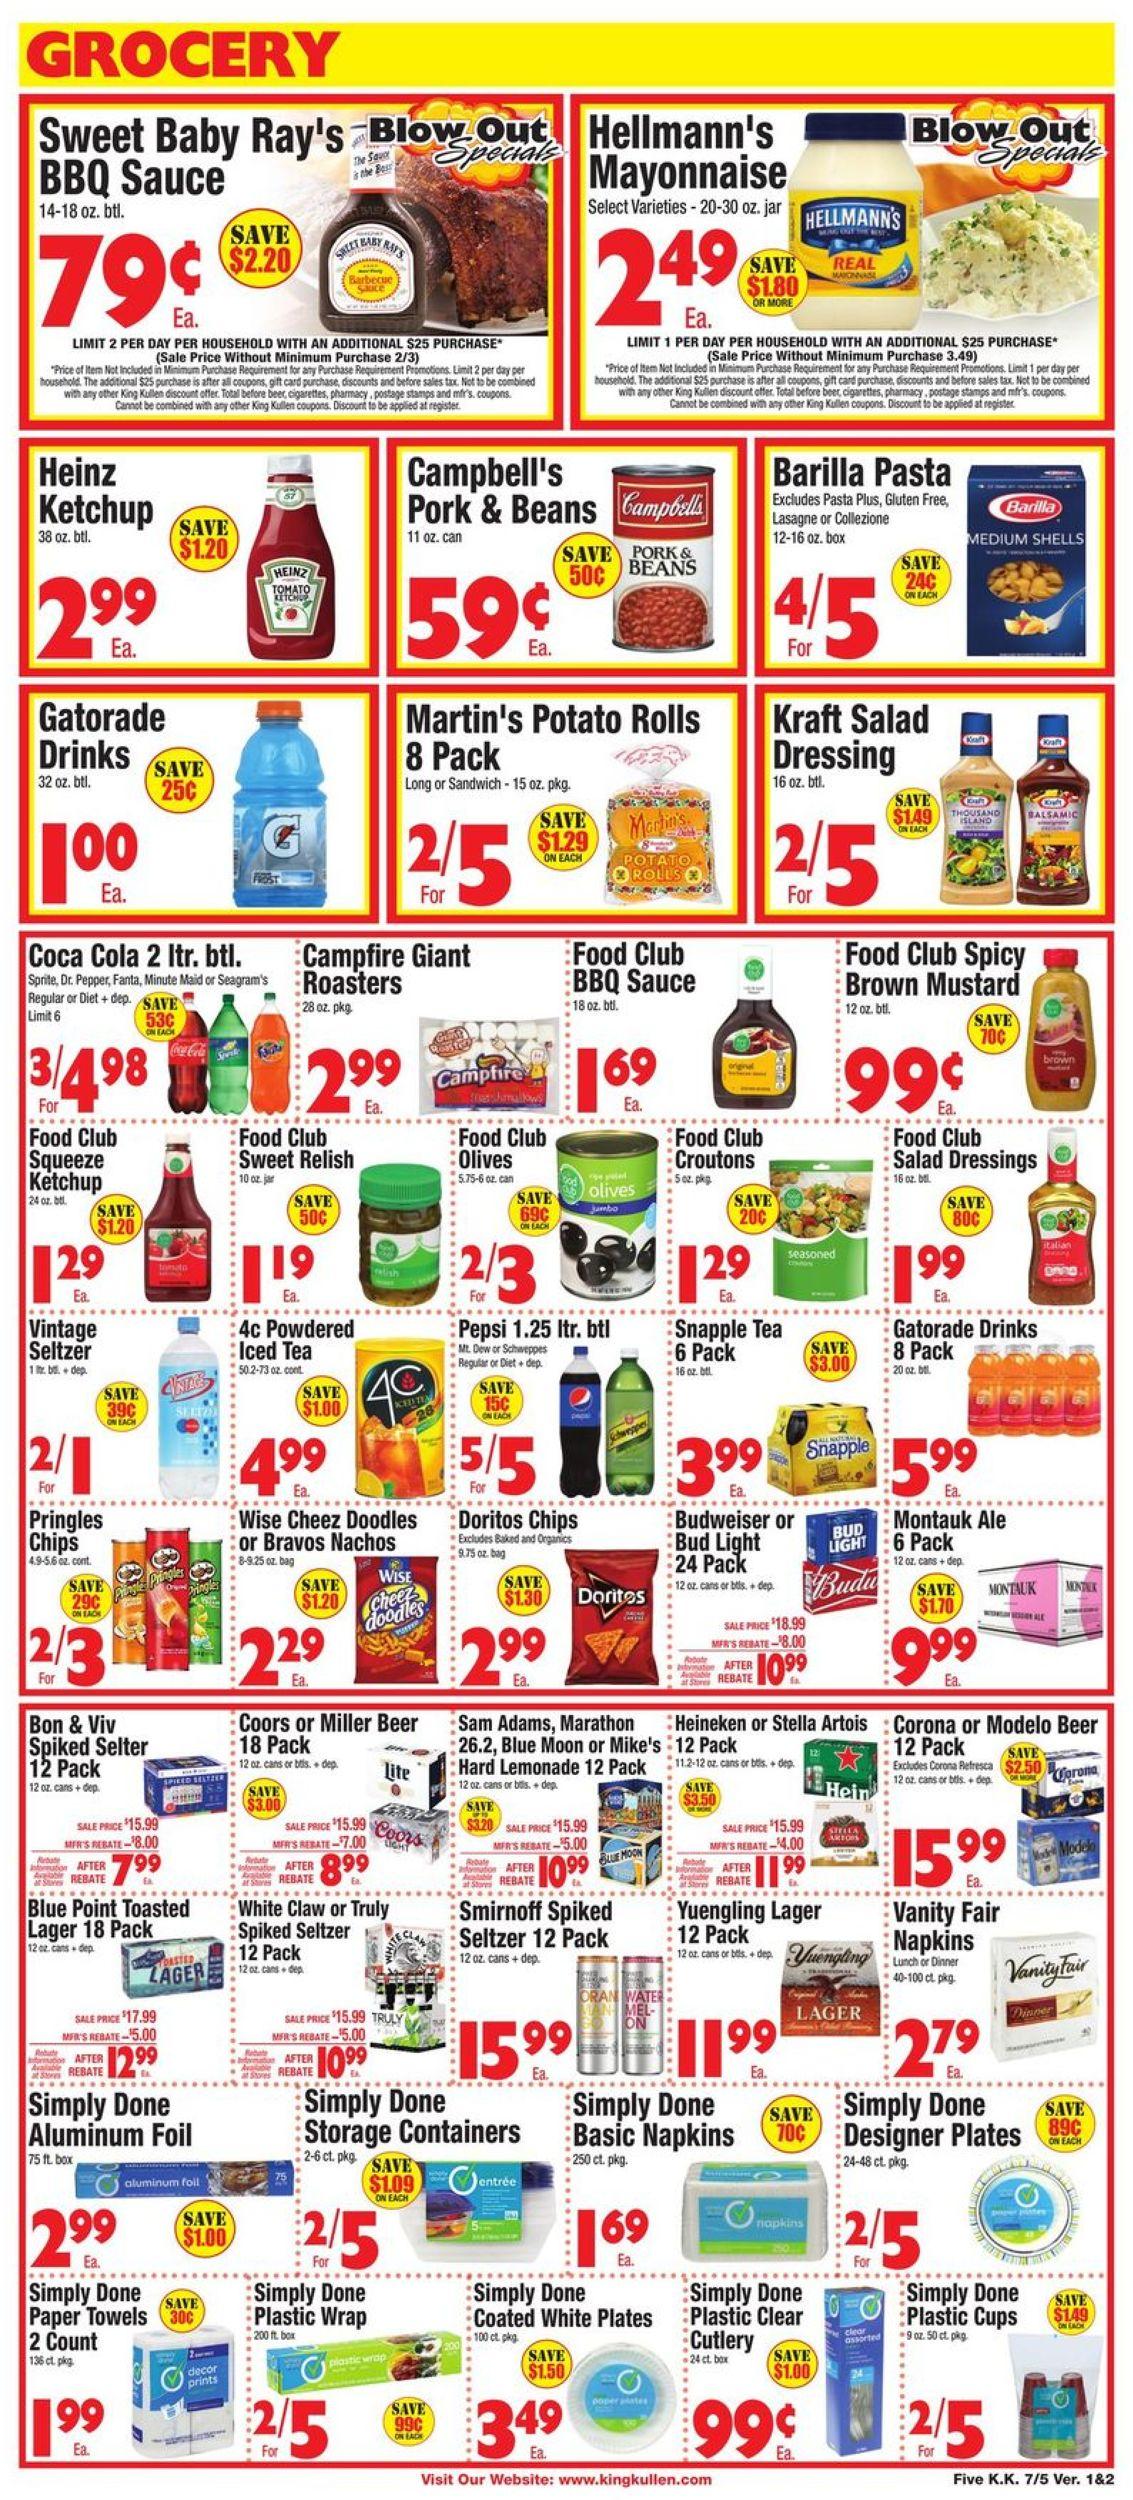 King Kullen Current weekly ad 07/05 - 07/11/2019 [5